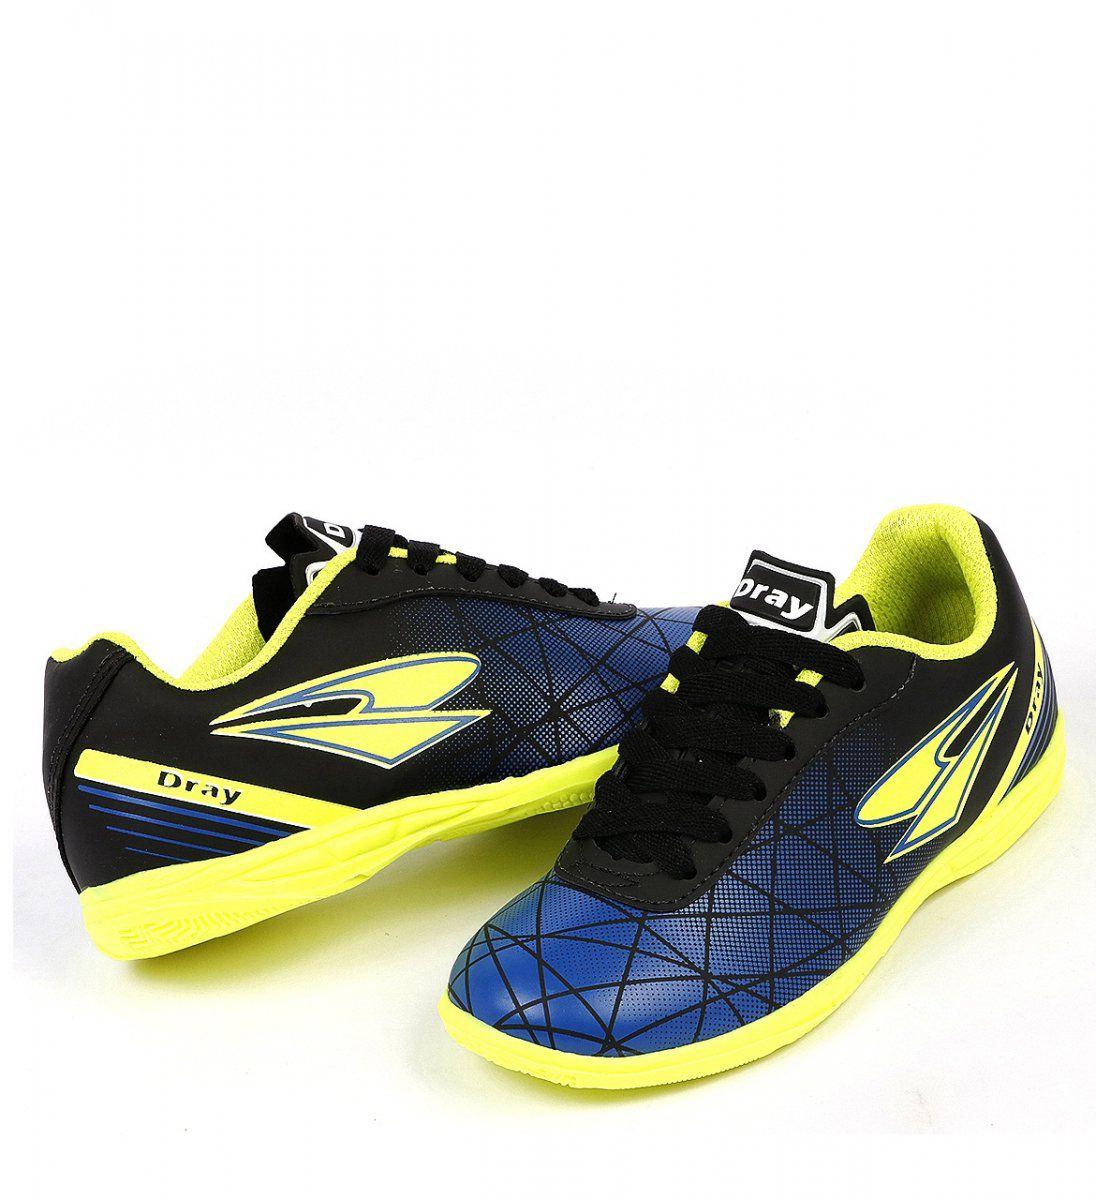 Chuteira Futsal Dray 306 - Preto/Azul